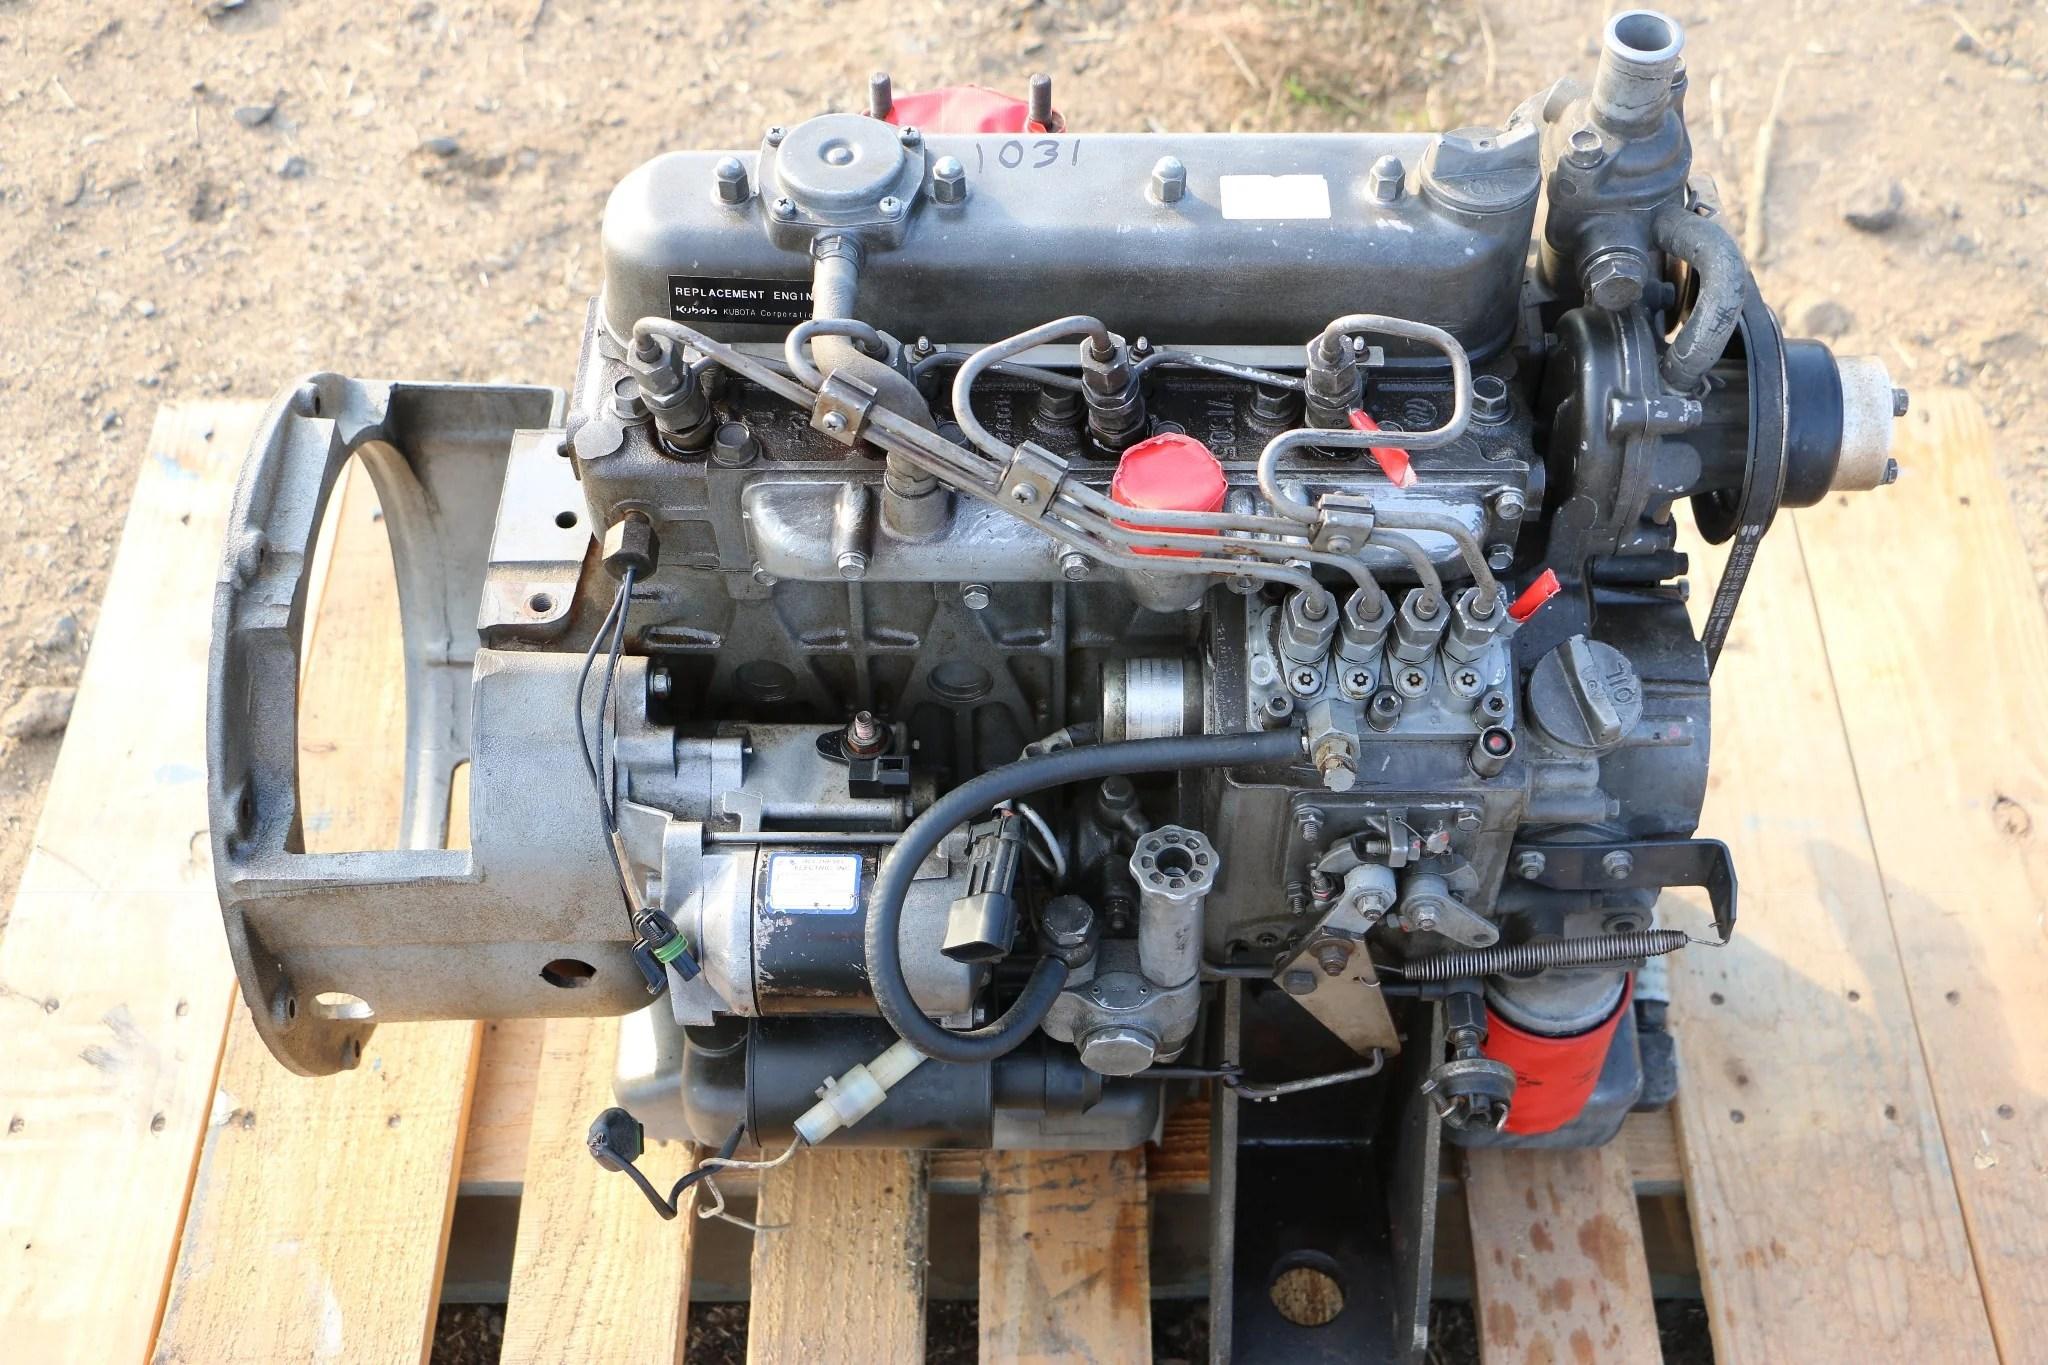 medium resolution of kubota v1505 diesel engine motor for bobcat pump generator etc 1031